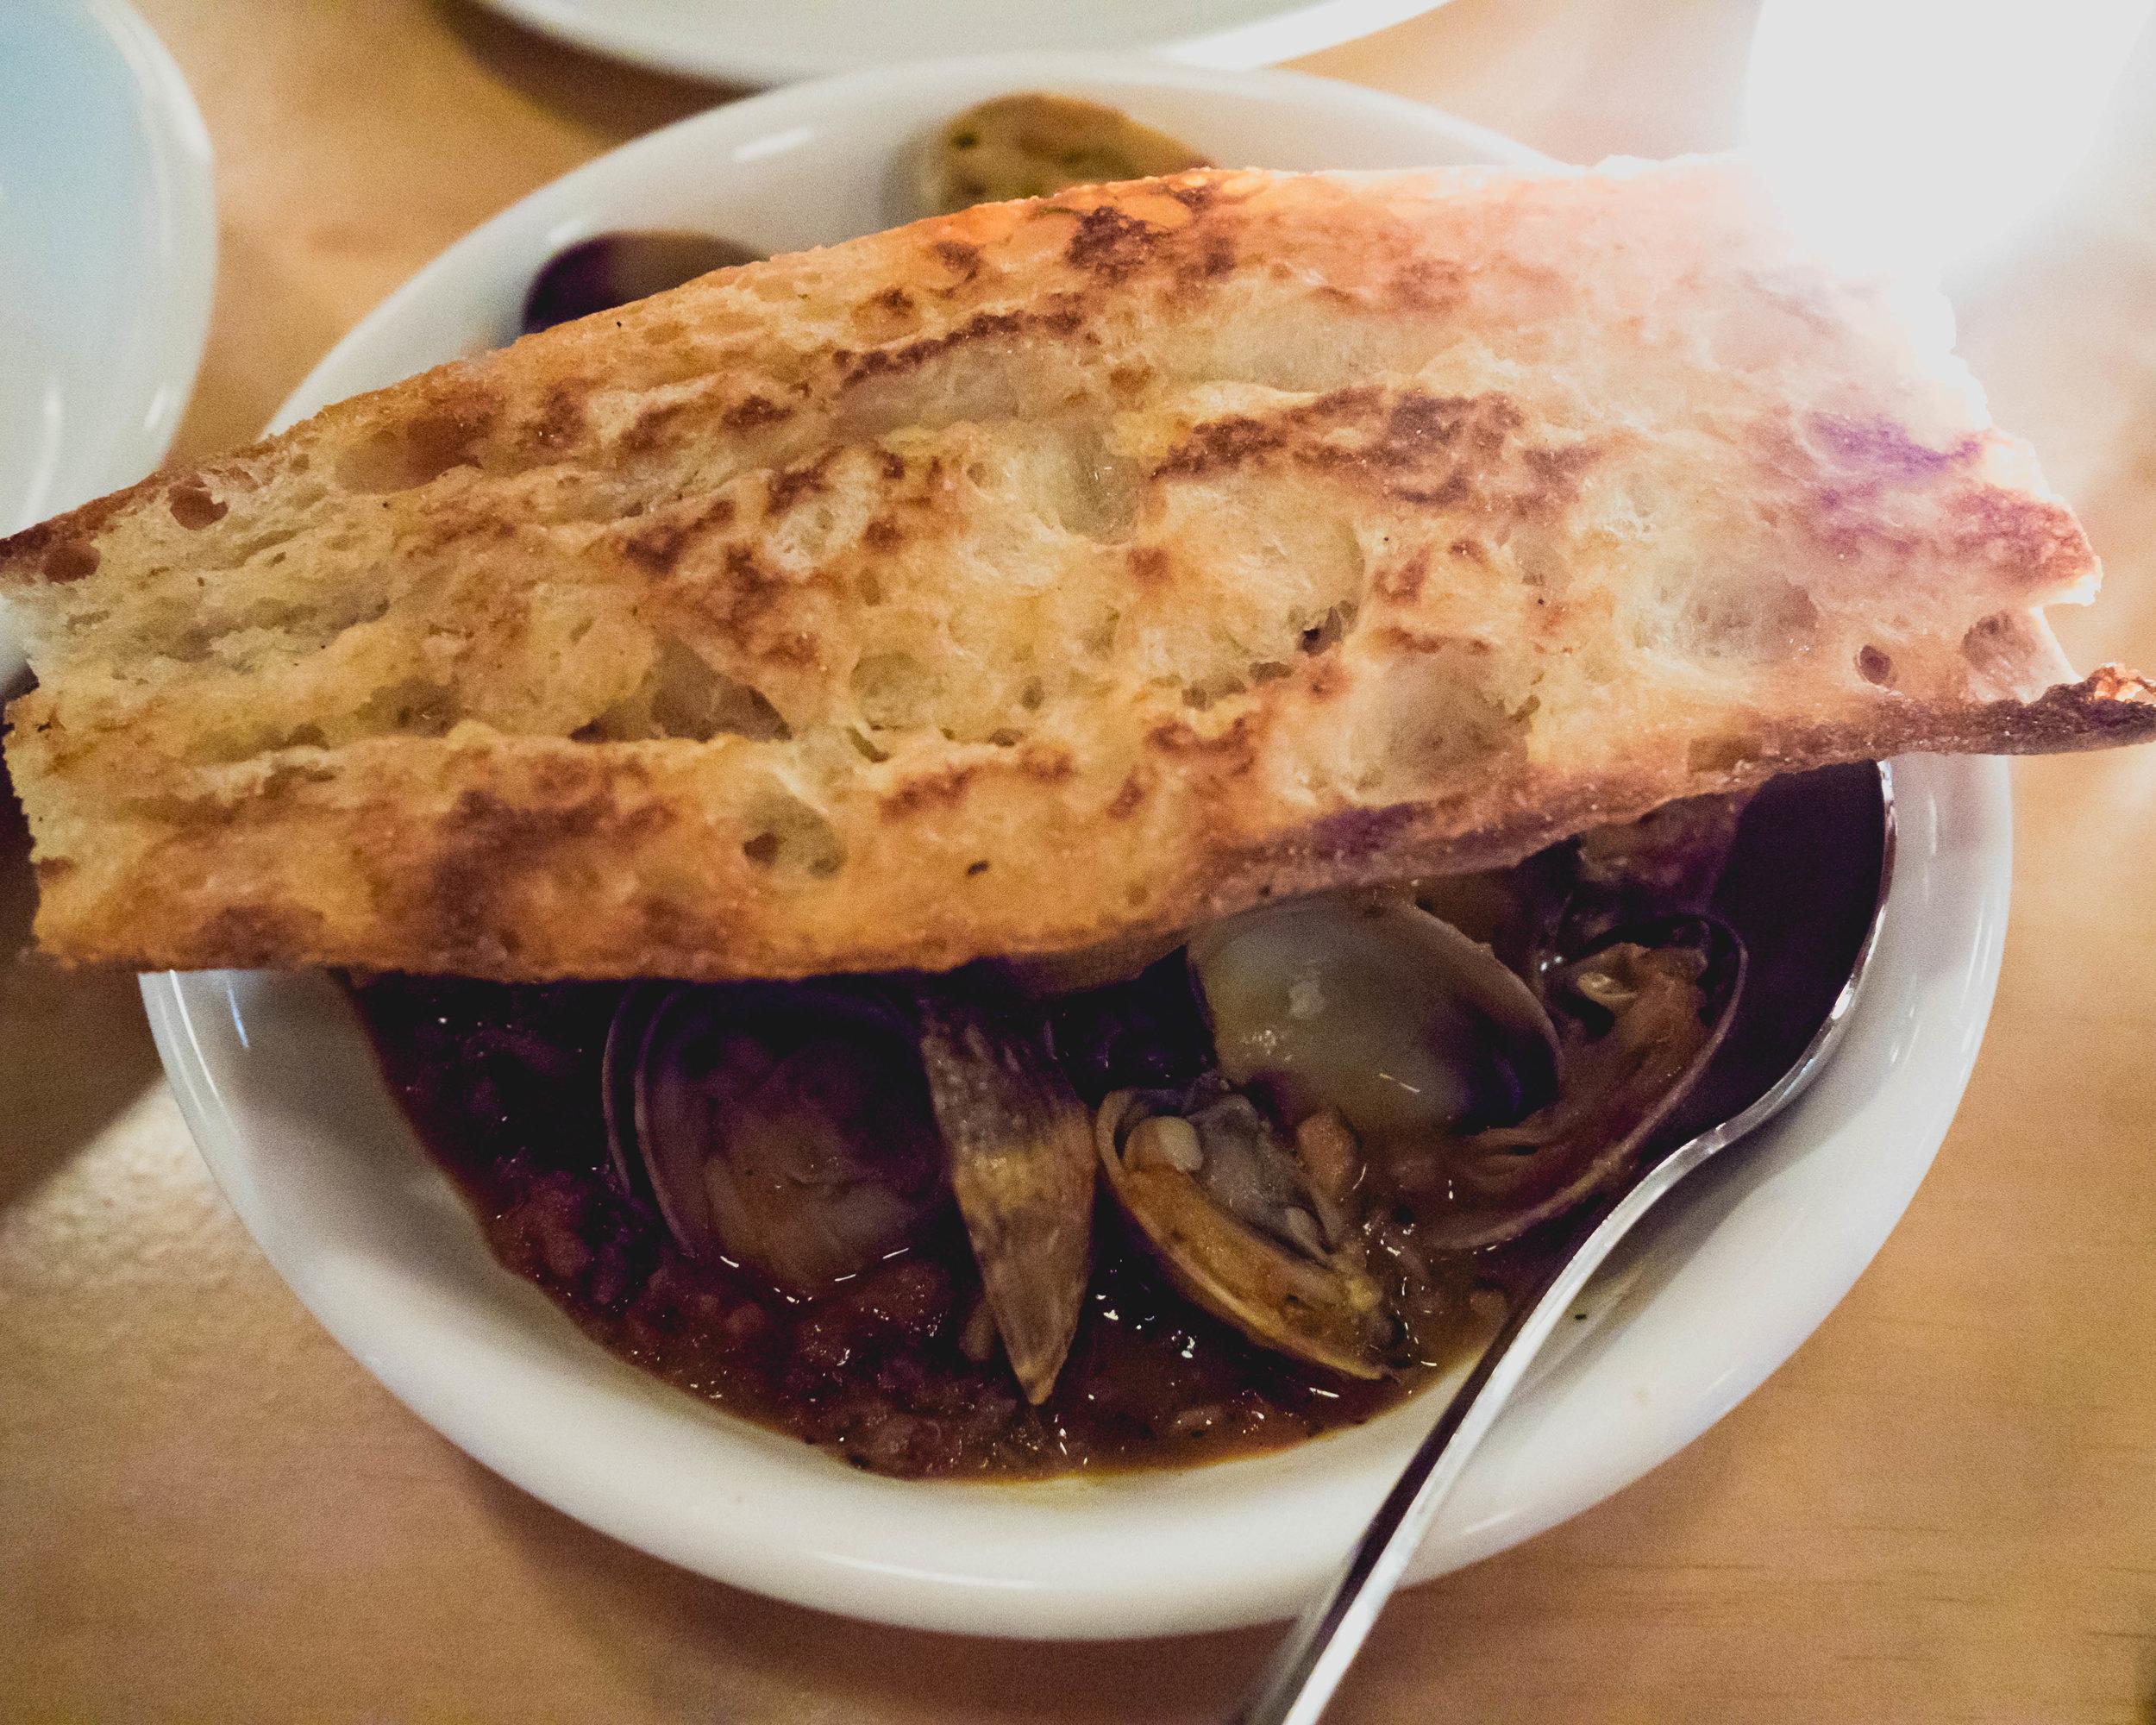 clams , merguez sausage, white beans, cavolo nero, sofrito, baguette.